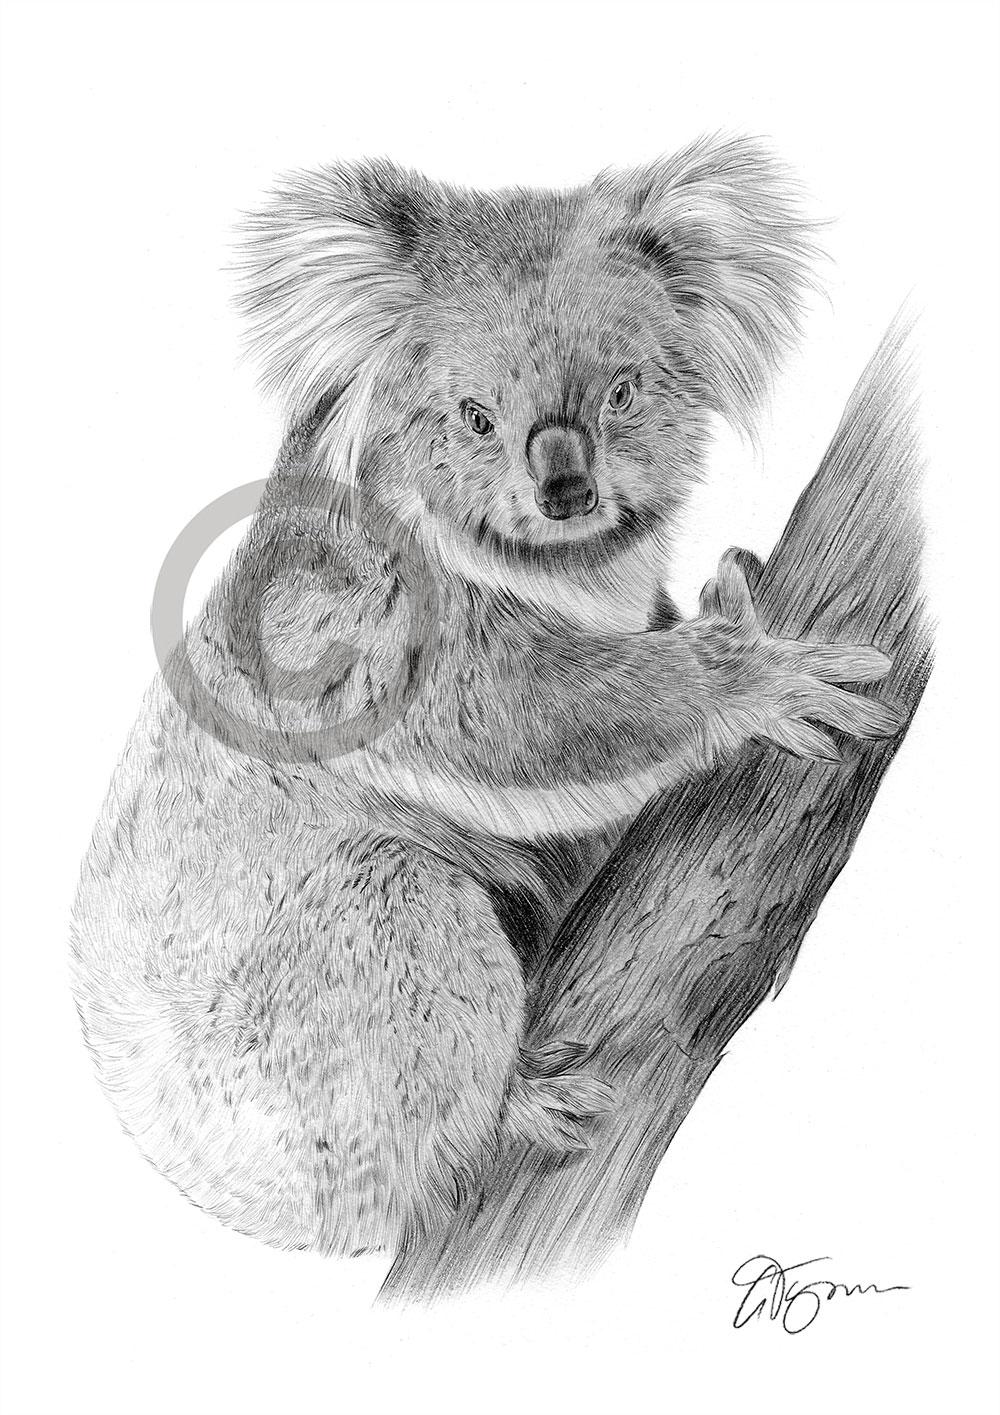 Pencil Drawing Of A Koala Bear By Artist Gary Tymon